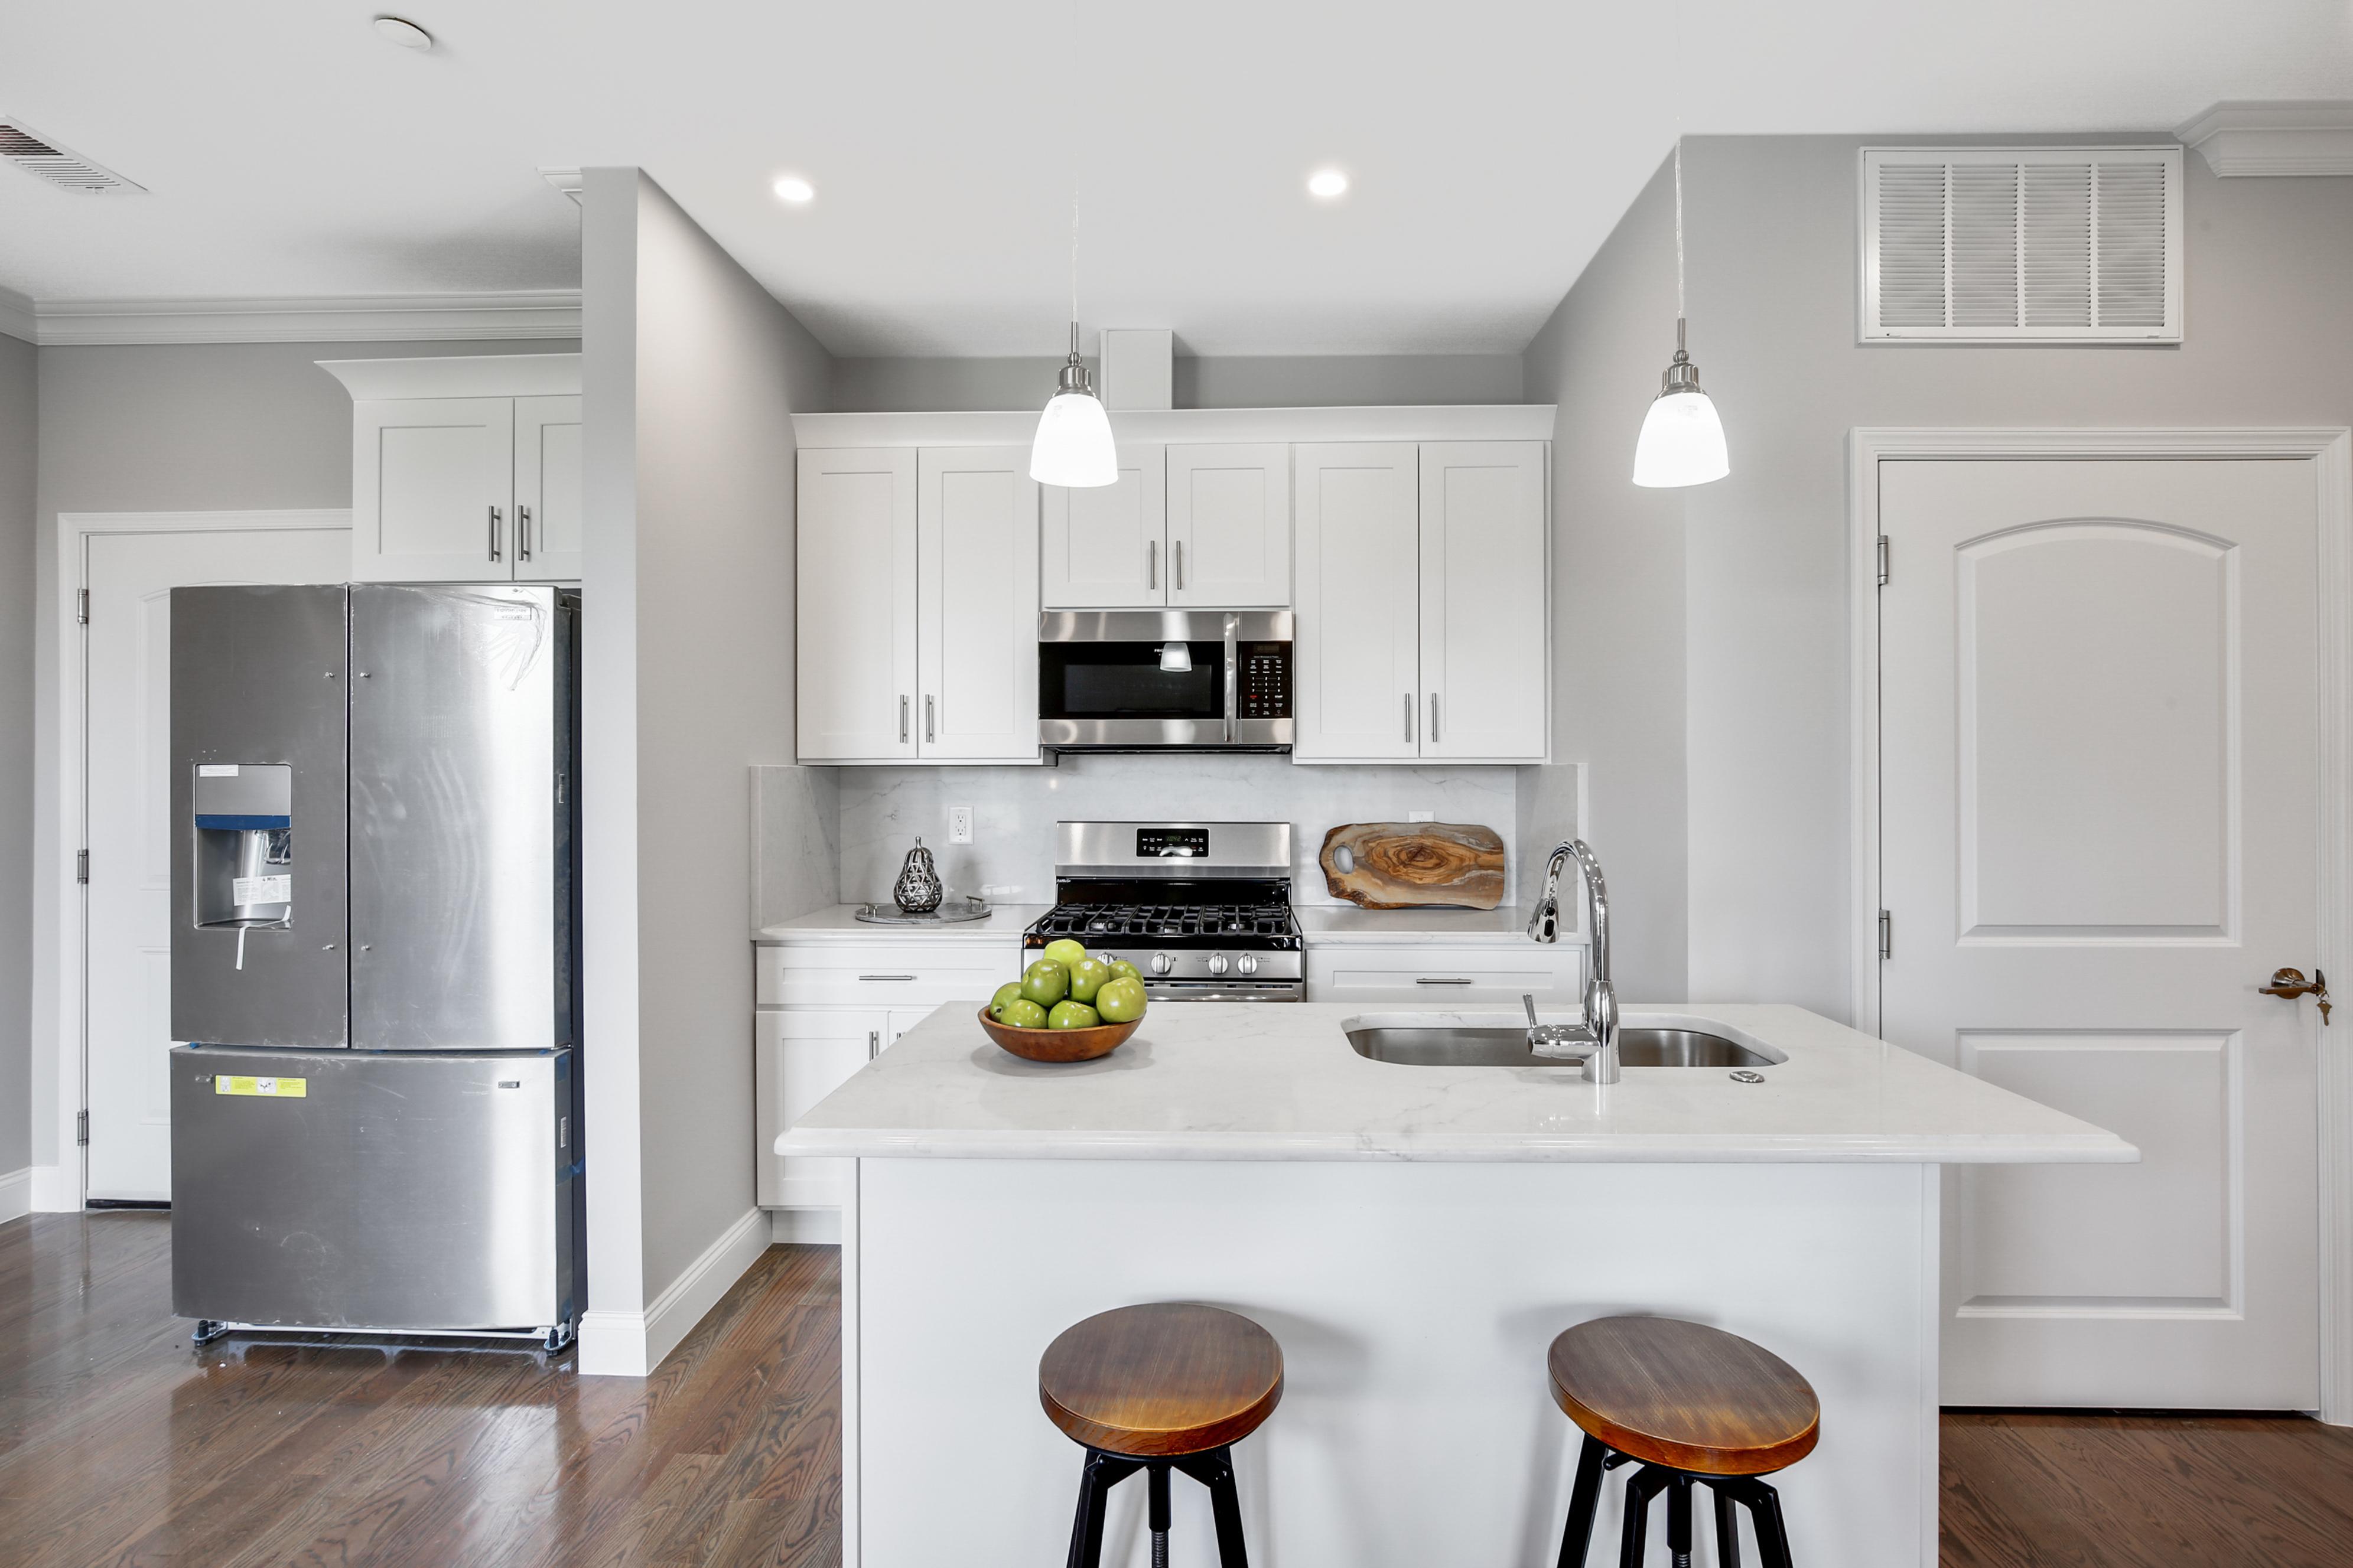 5 Secrets to a Successful Home Search